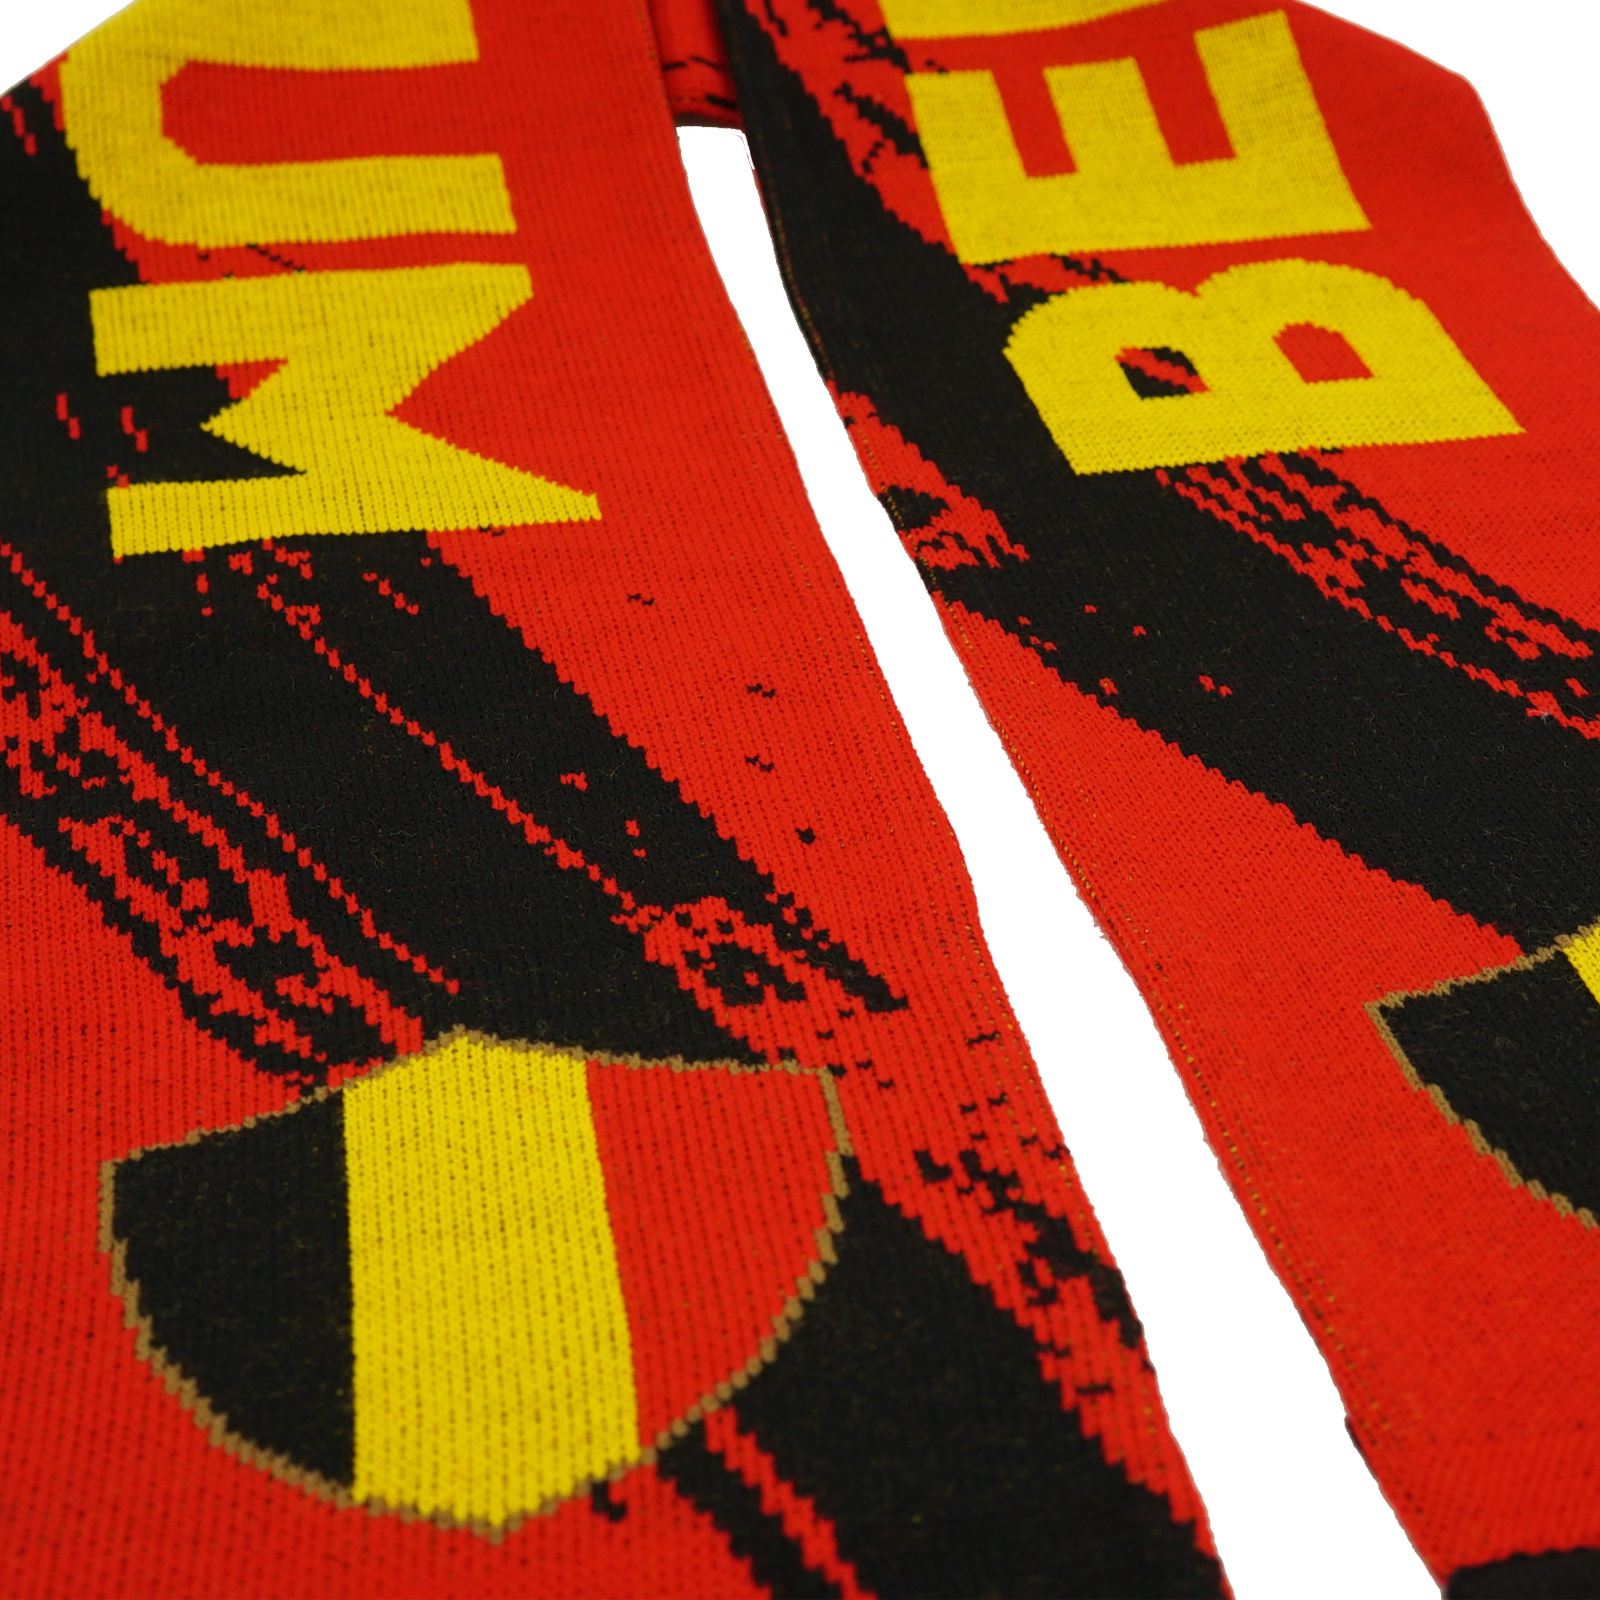 Sjaal België penseelstreek